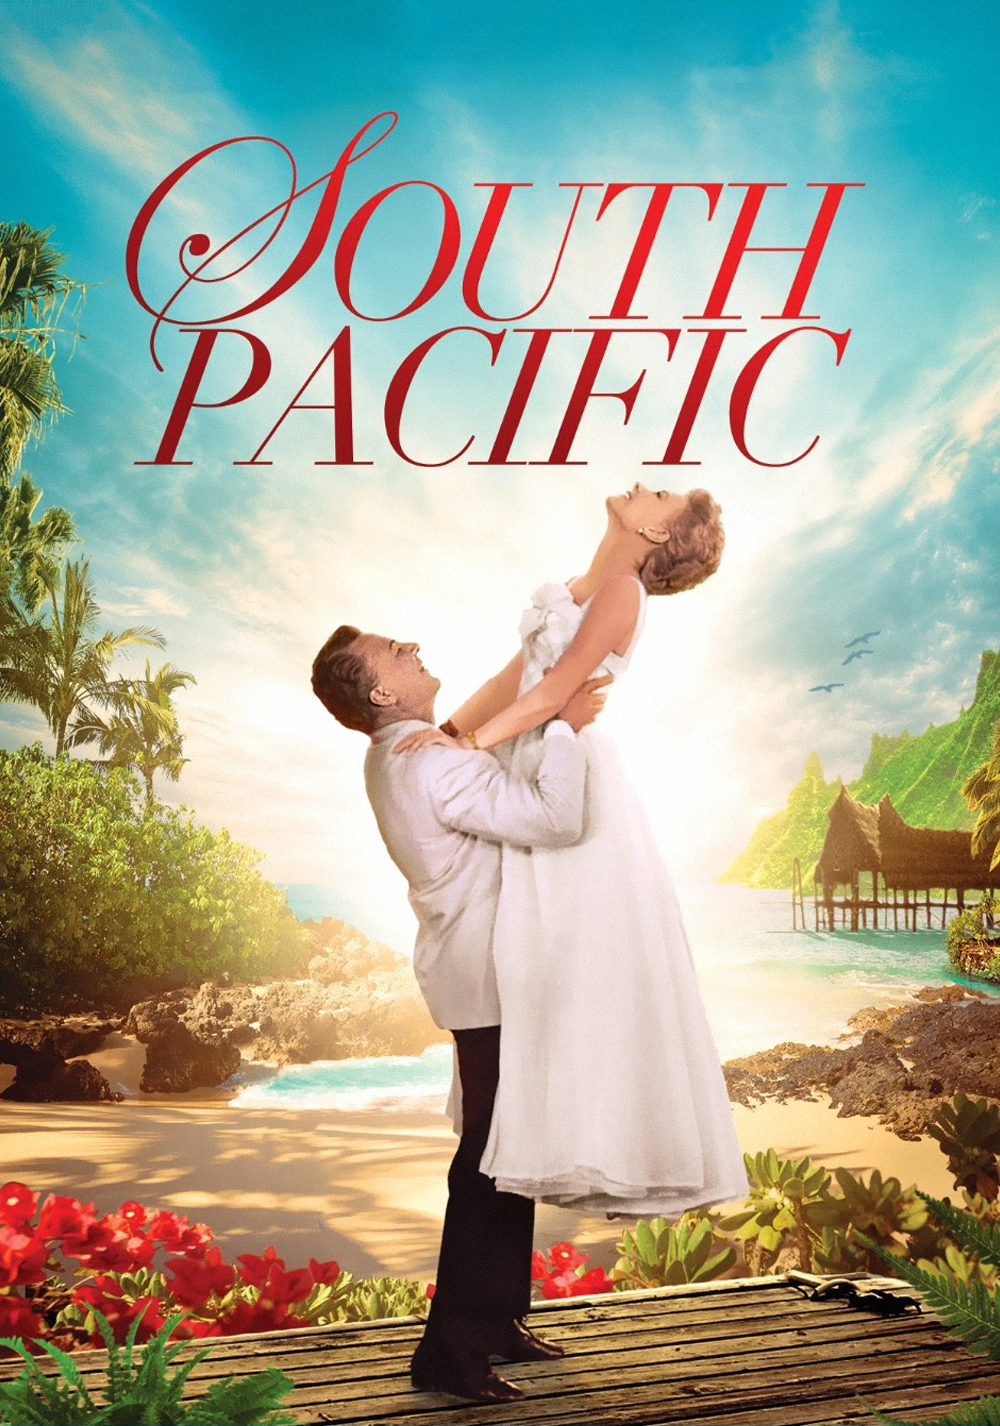 south-pacific-5a6298e99f8f9.jpg